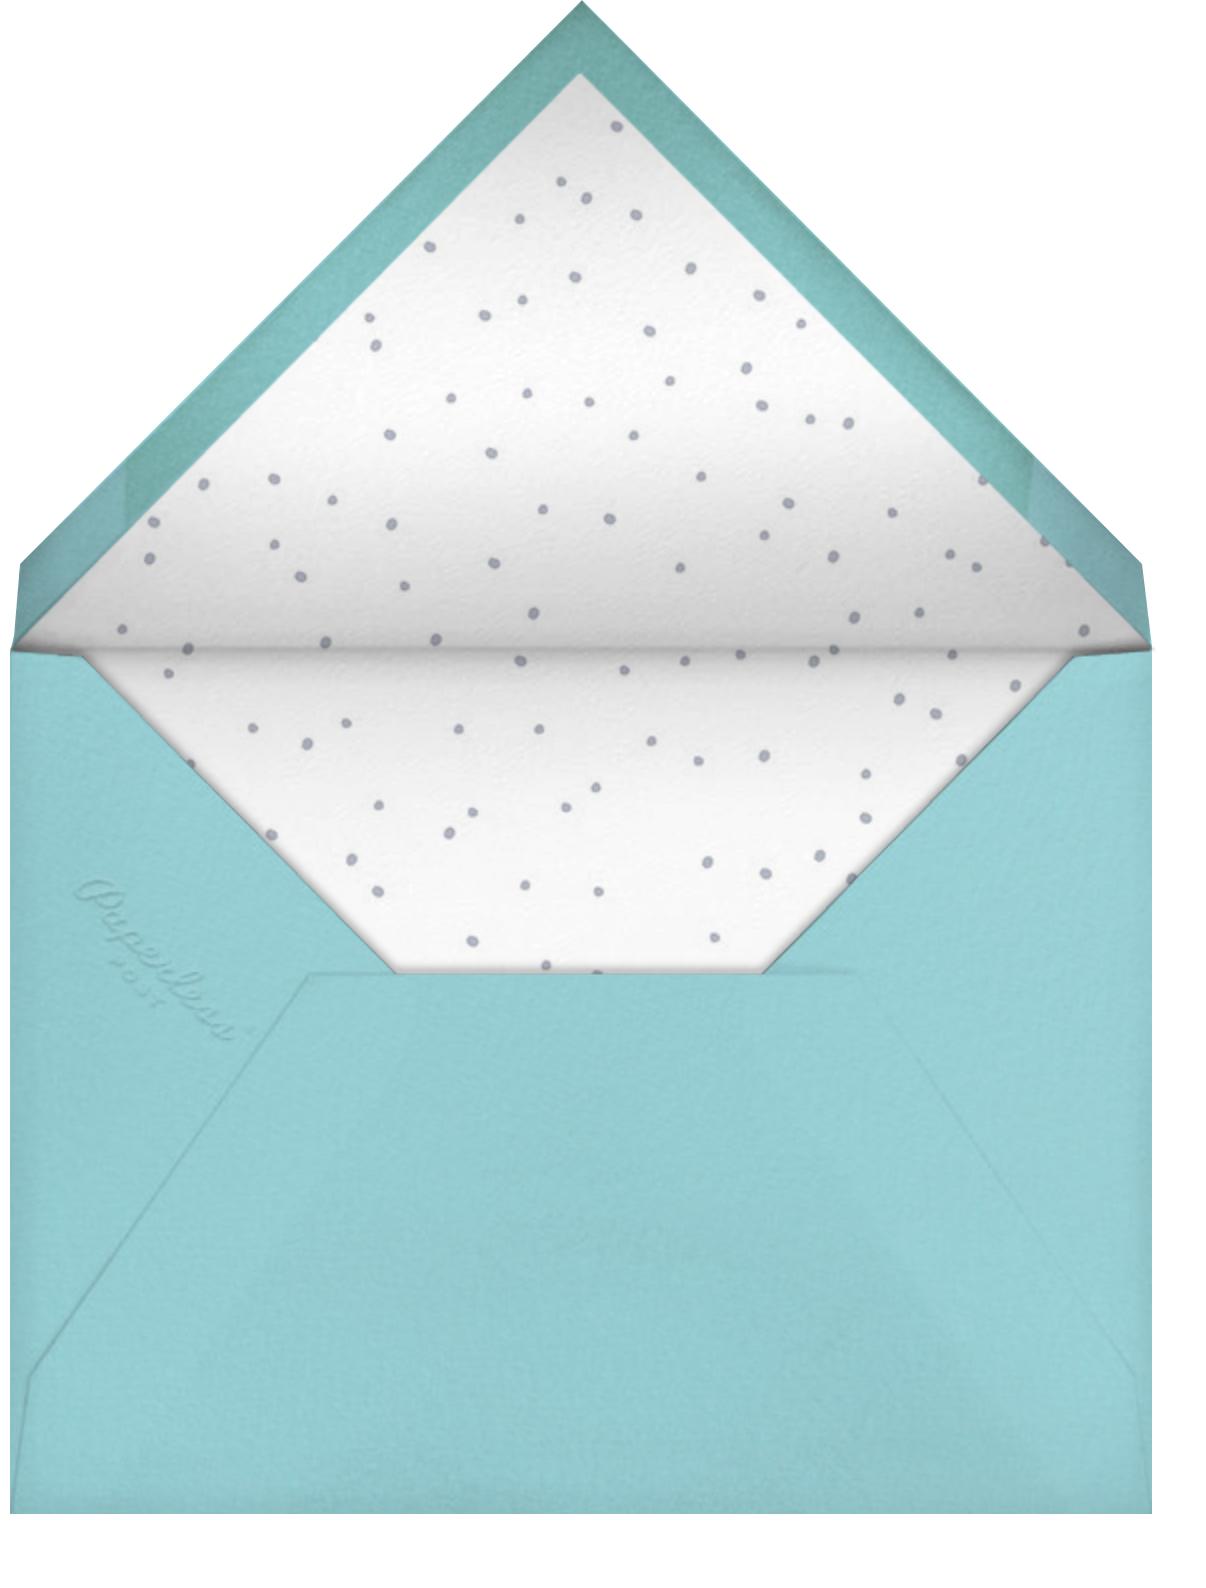 Birdie's Town (Square) - Little Cube - Housewarming - envelope back